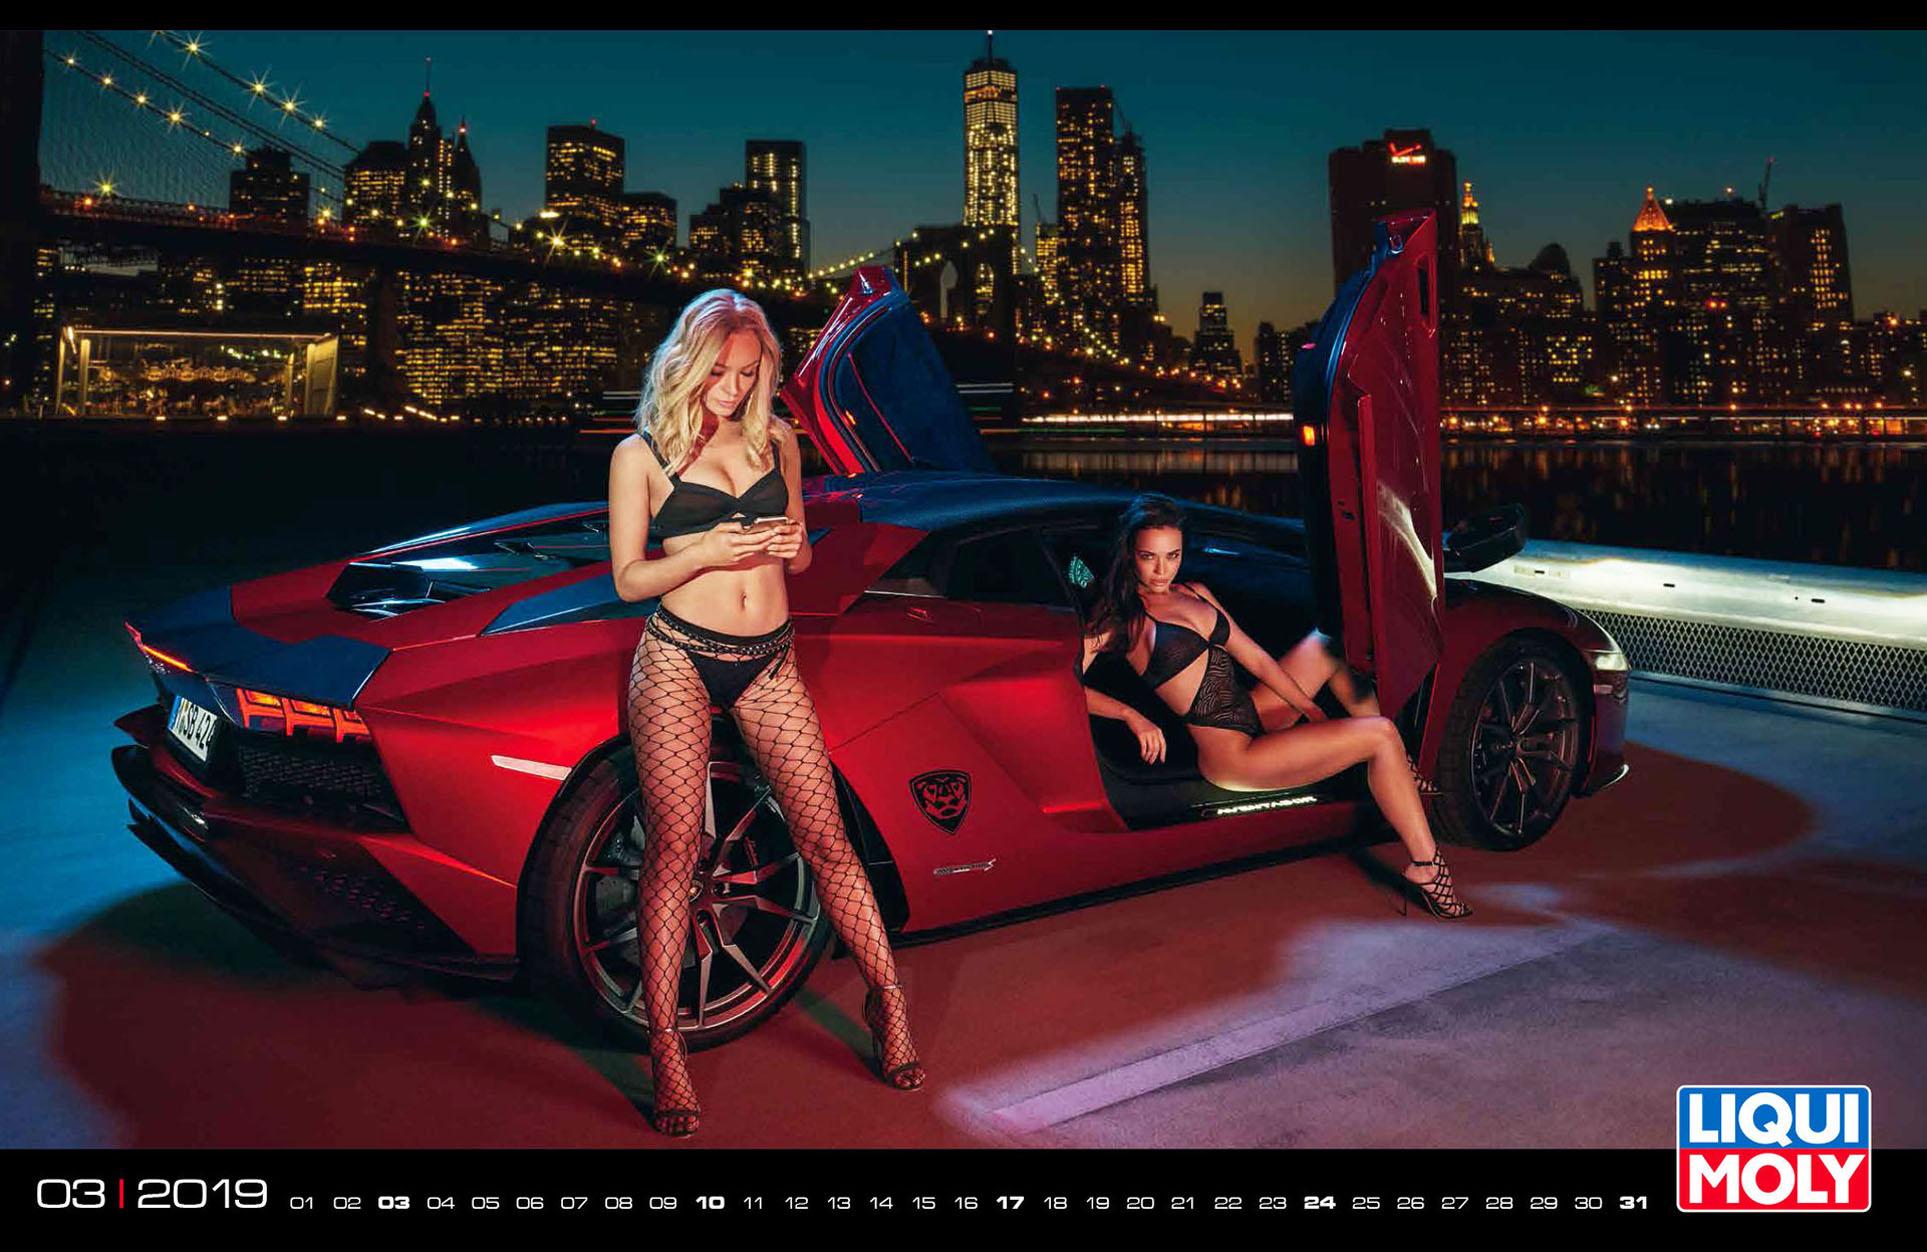 девушки и автомобили в календаре Liqui Moly calendar 2019